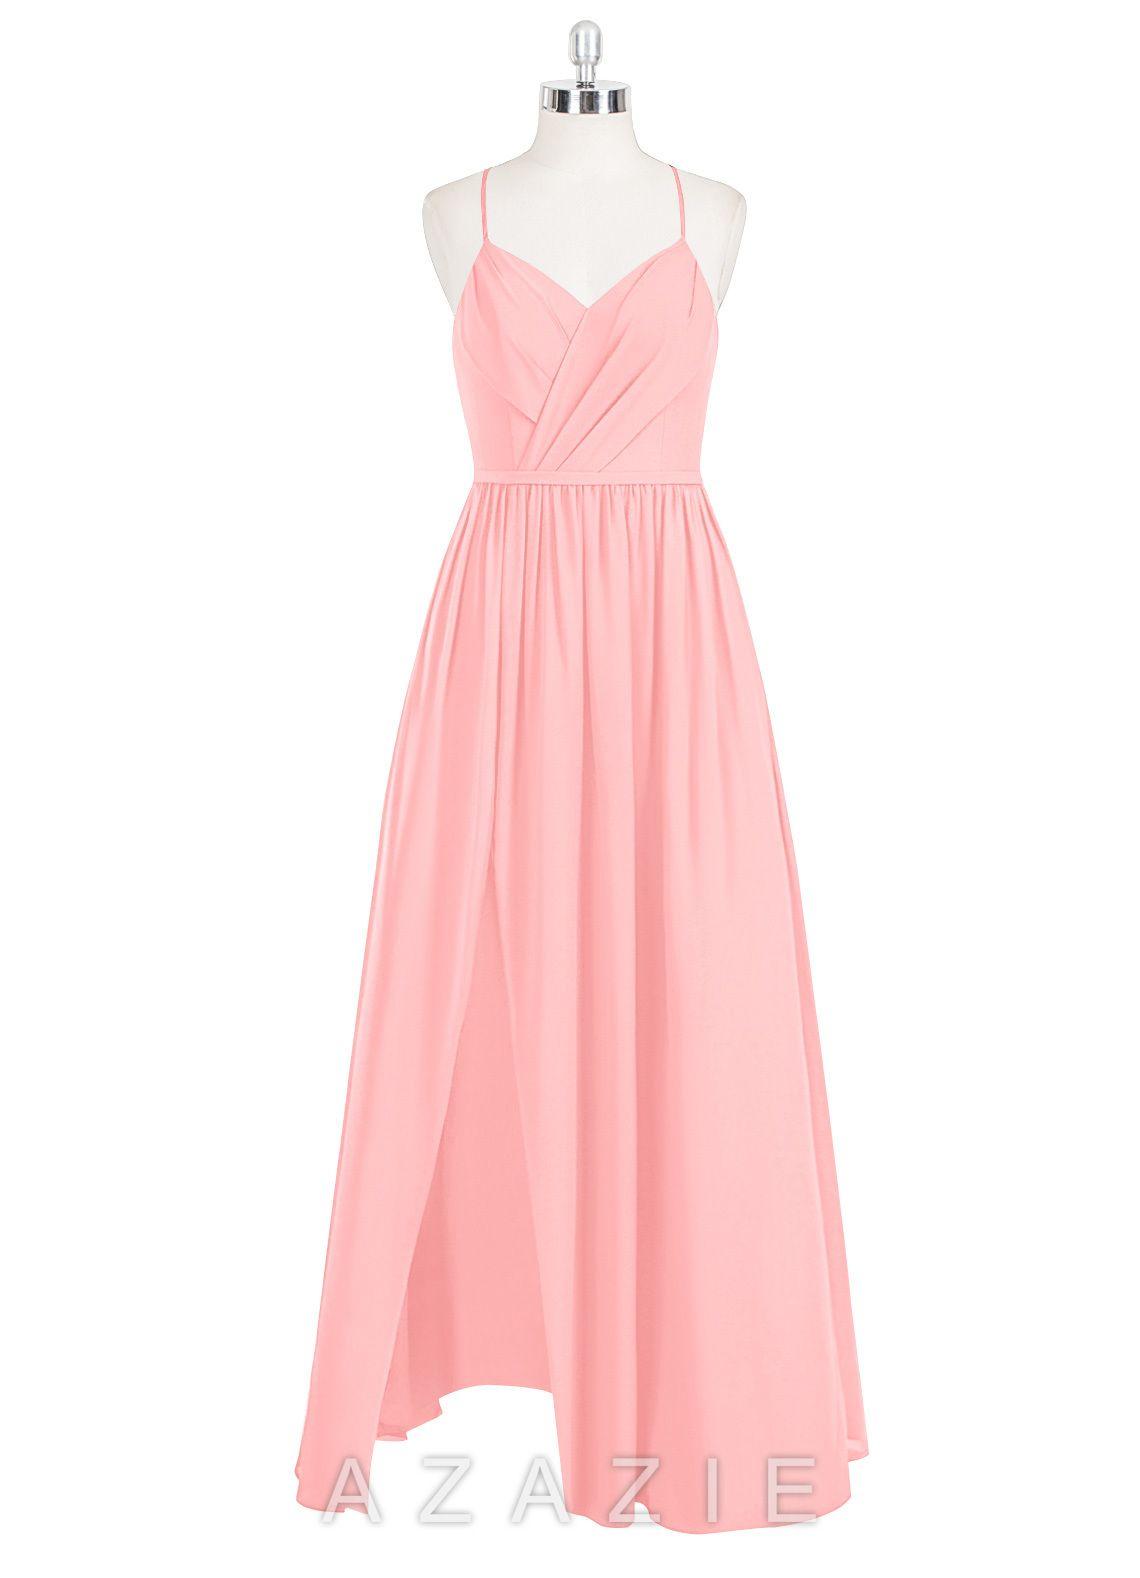 Cora bridesmaid dress favorite color bridal parties and weddings cora bridesmaid dress ombrellifo Gallery